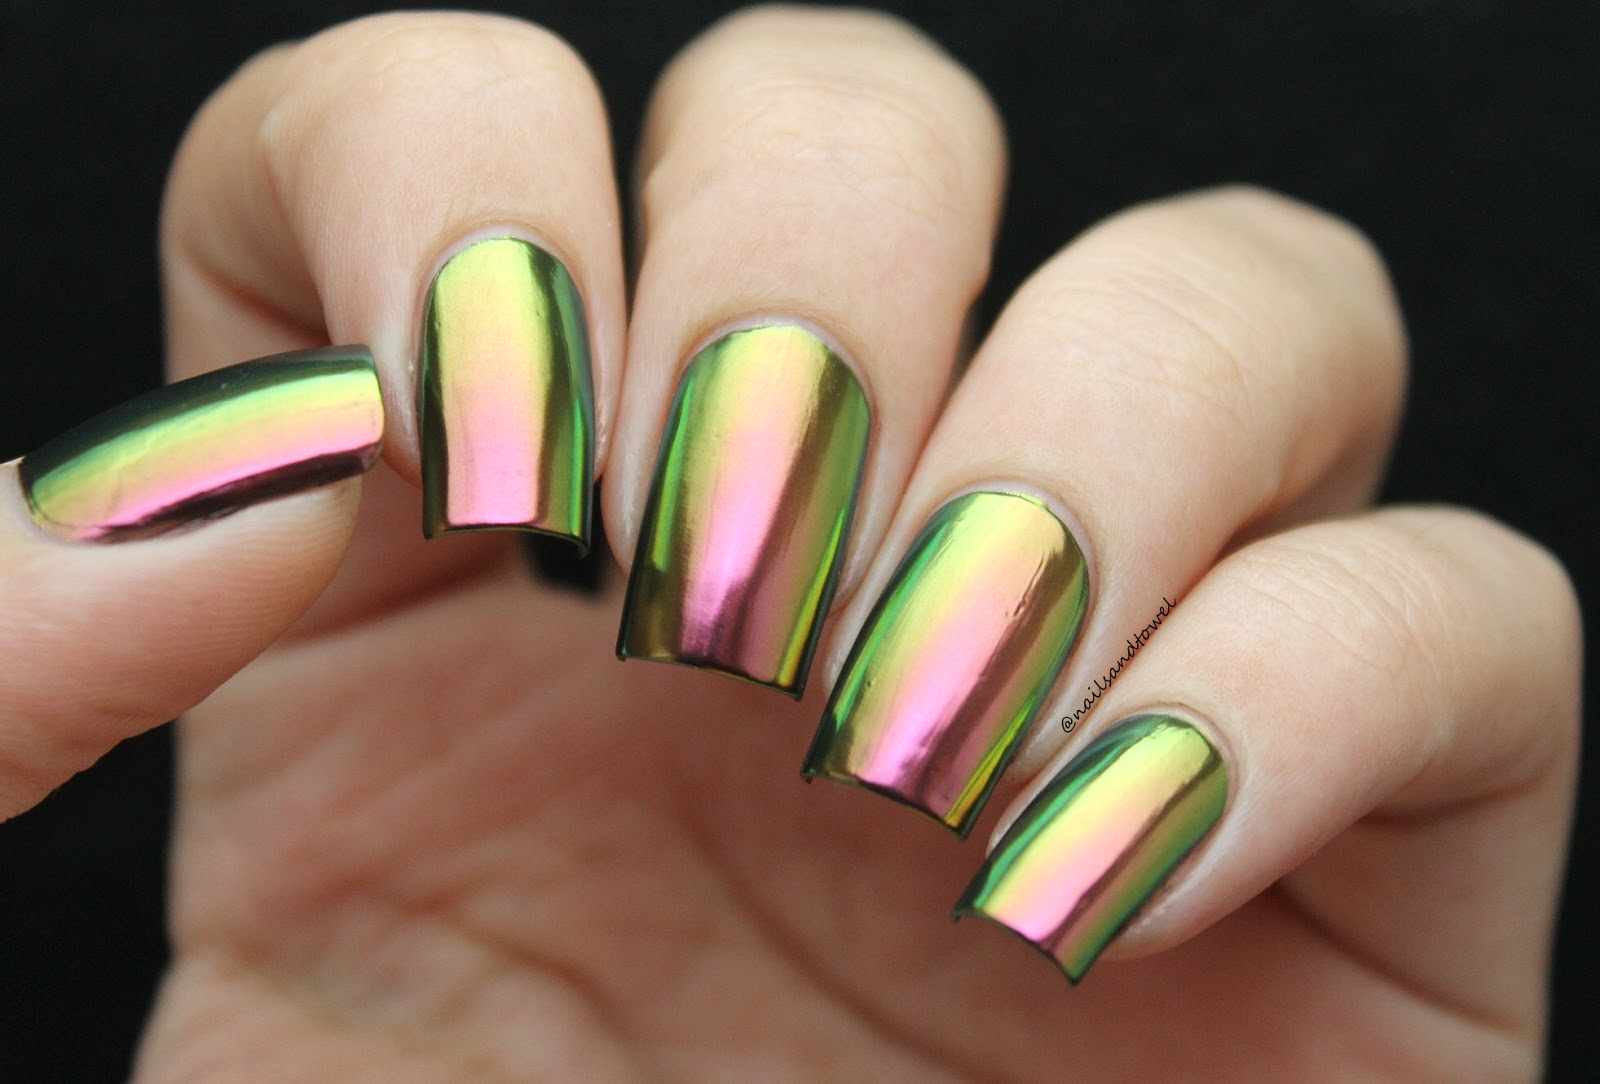 My Nail Art Journal: Multi-Chrome Powder + Whats Up Nails